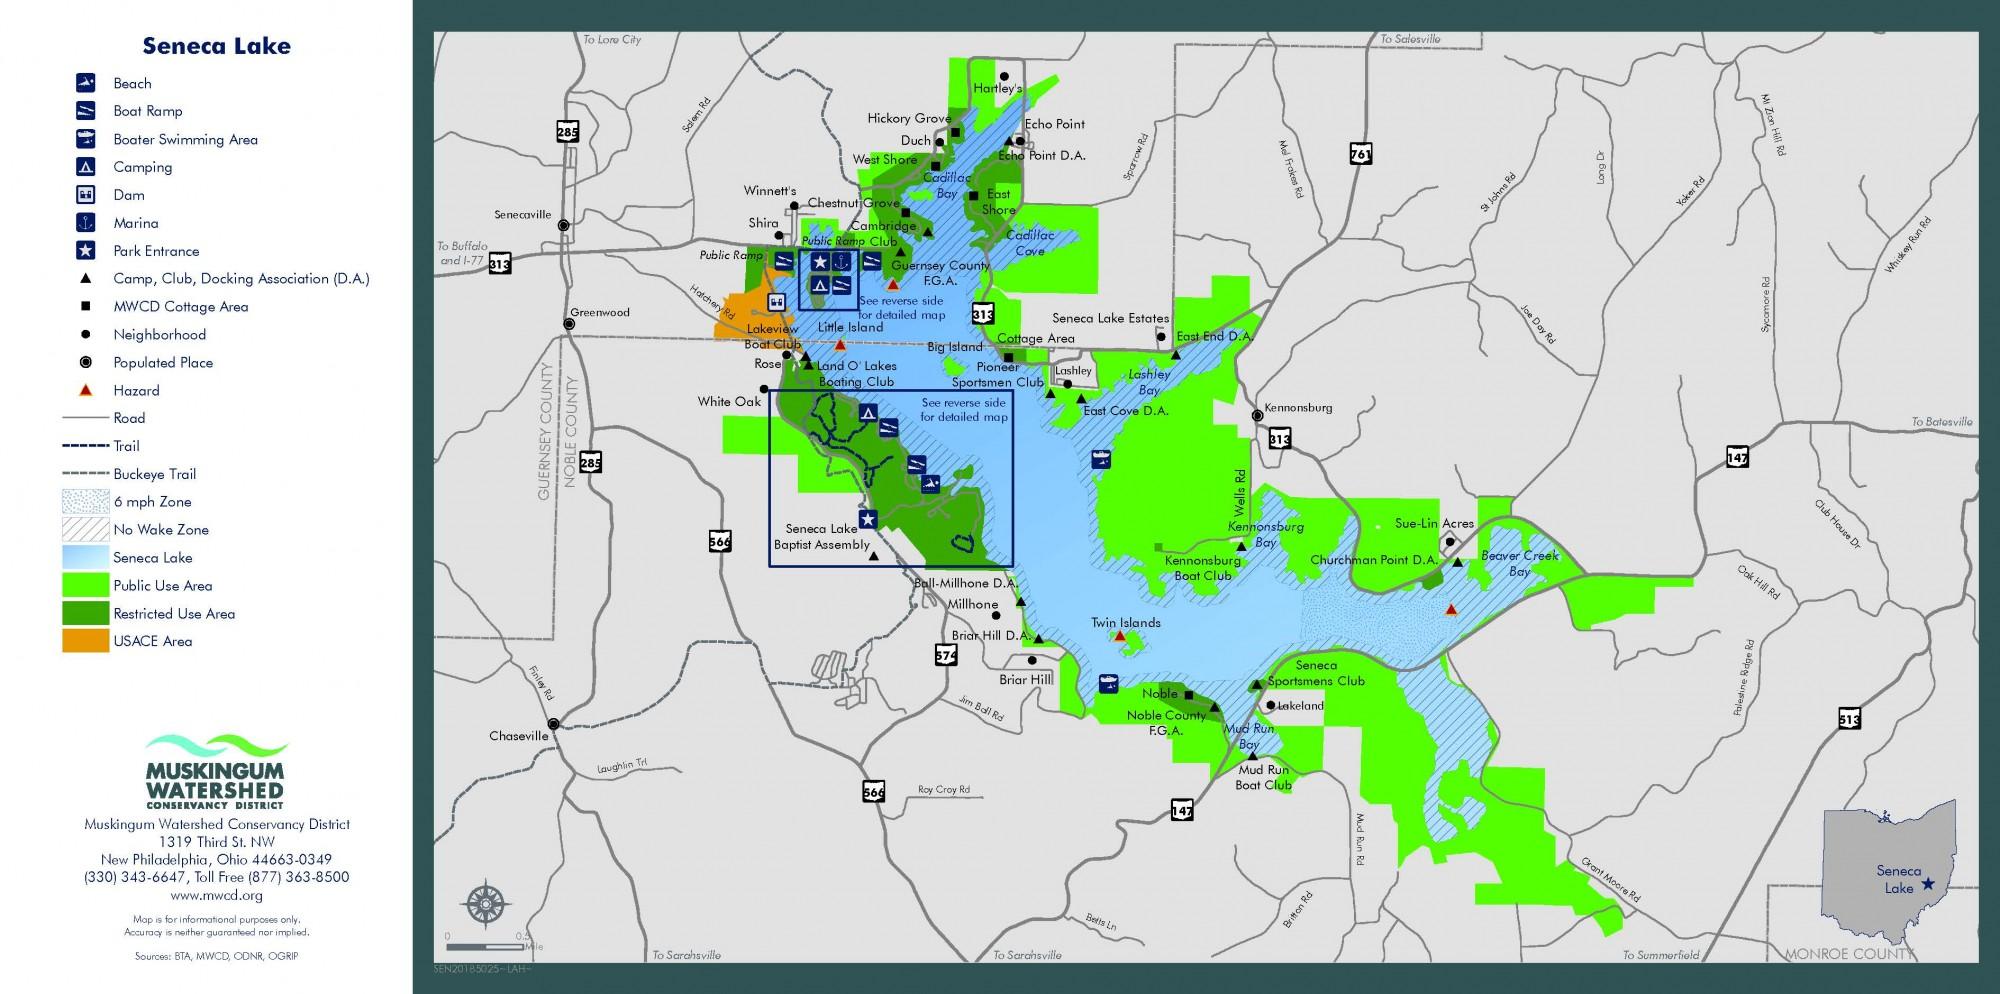 map of seneca lake Maps And Locations Seneca Lake Park Ohio map of seneca lake